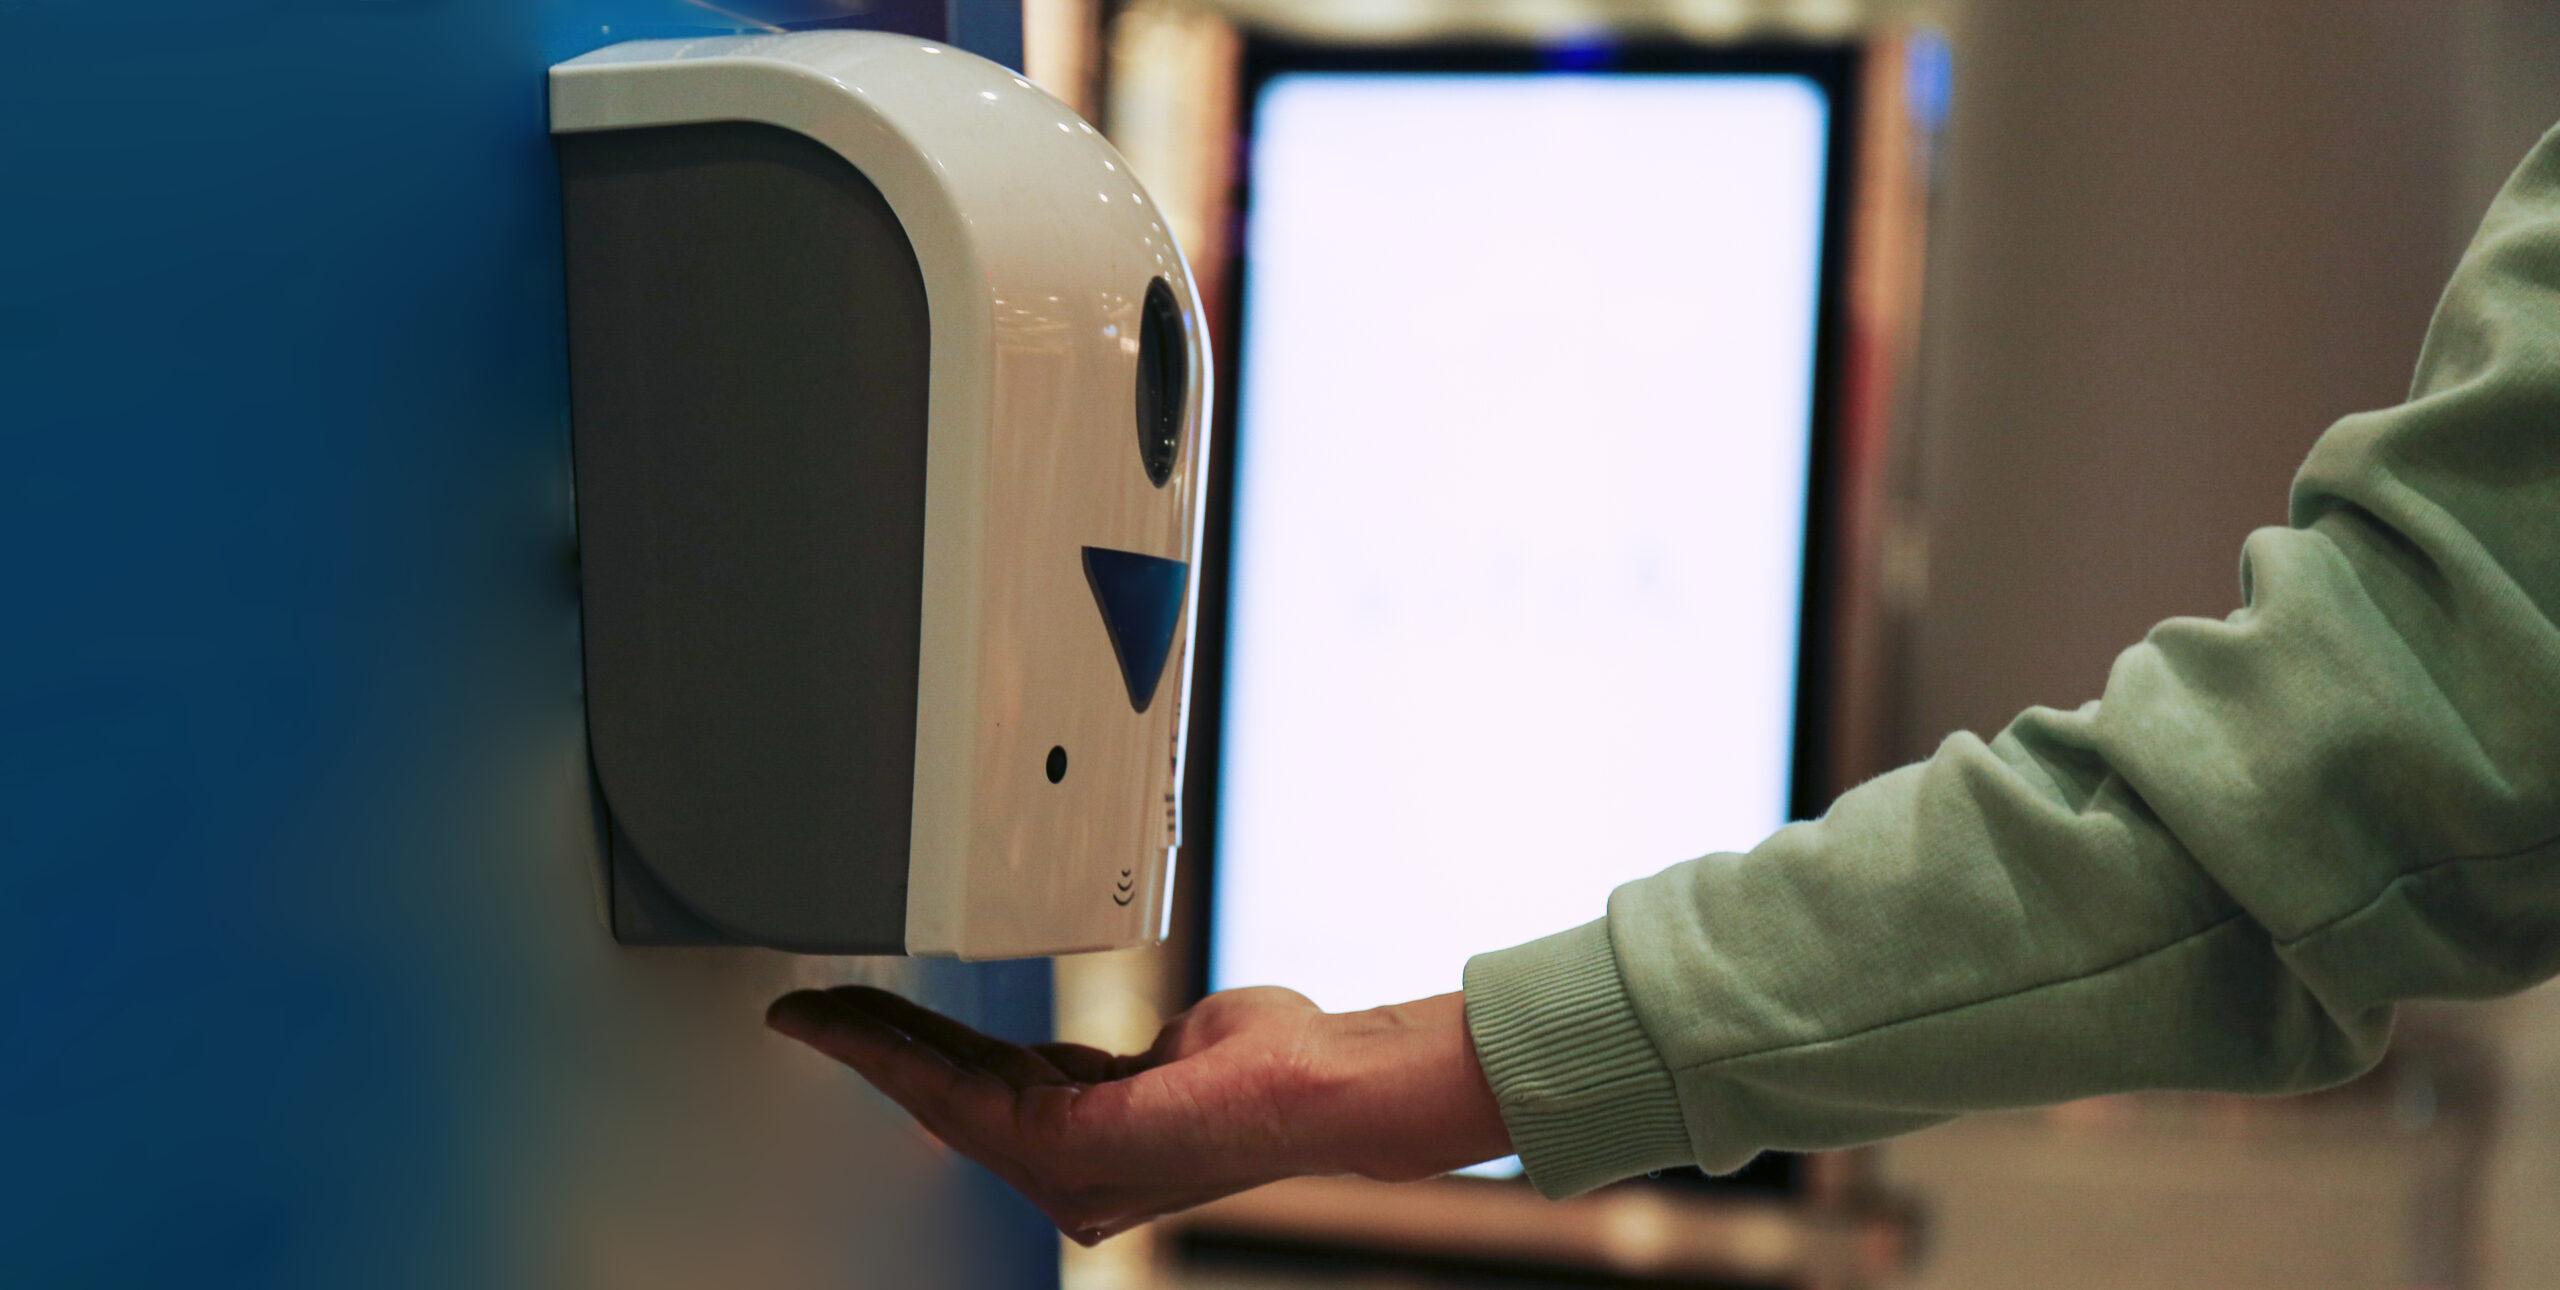 Conactless hand sanitiser dispense